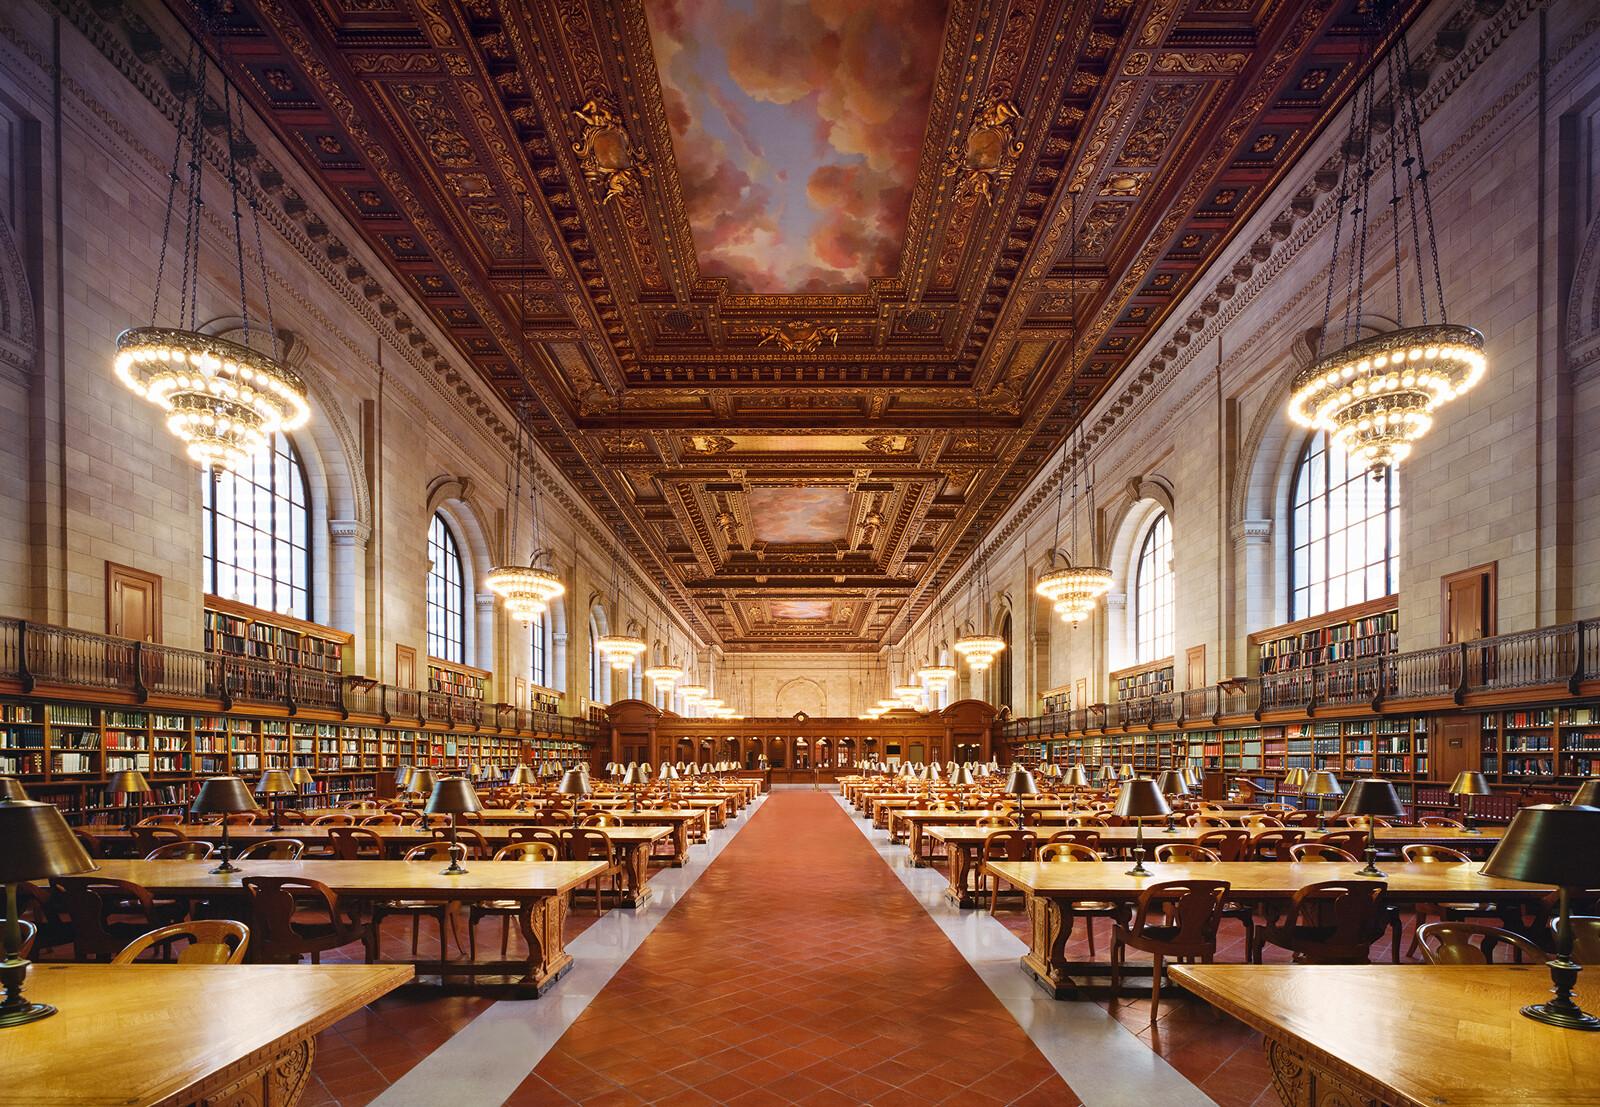 New York Public Library - Rafael Neff